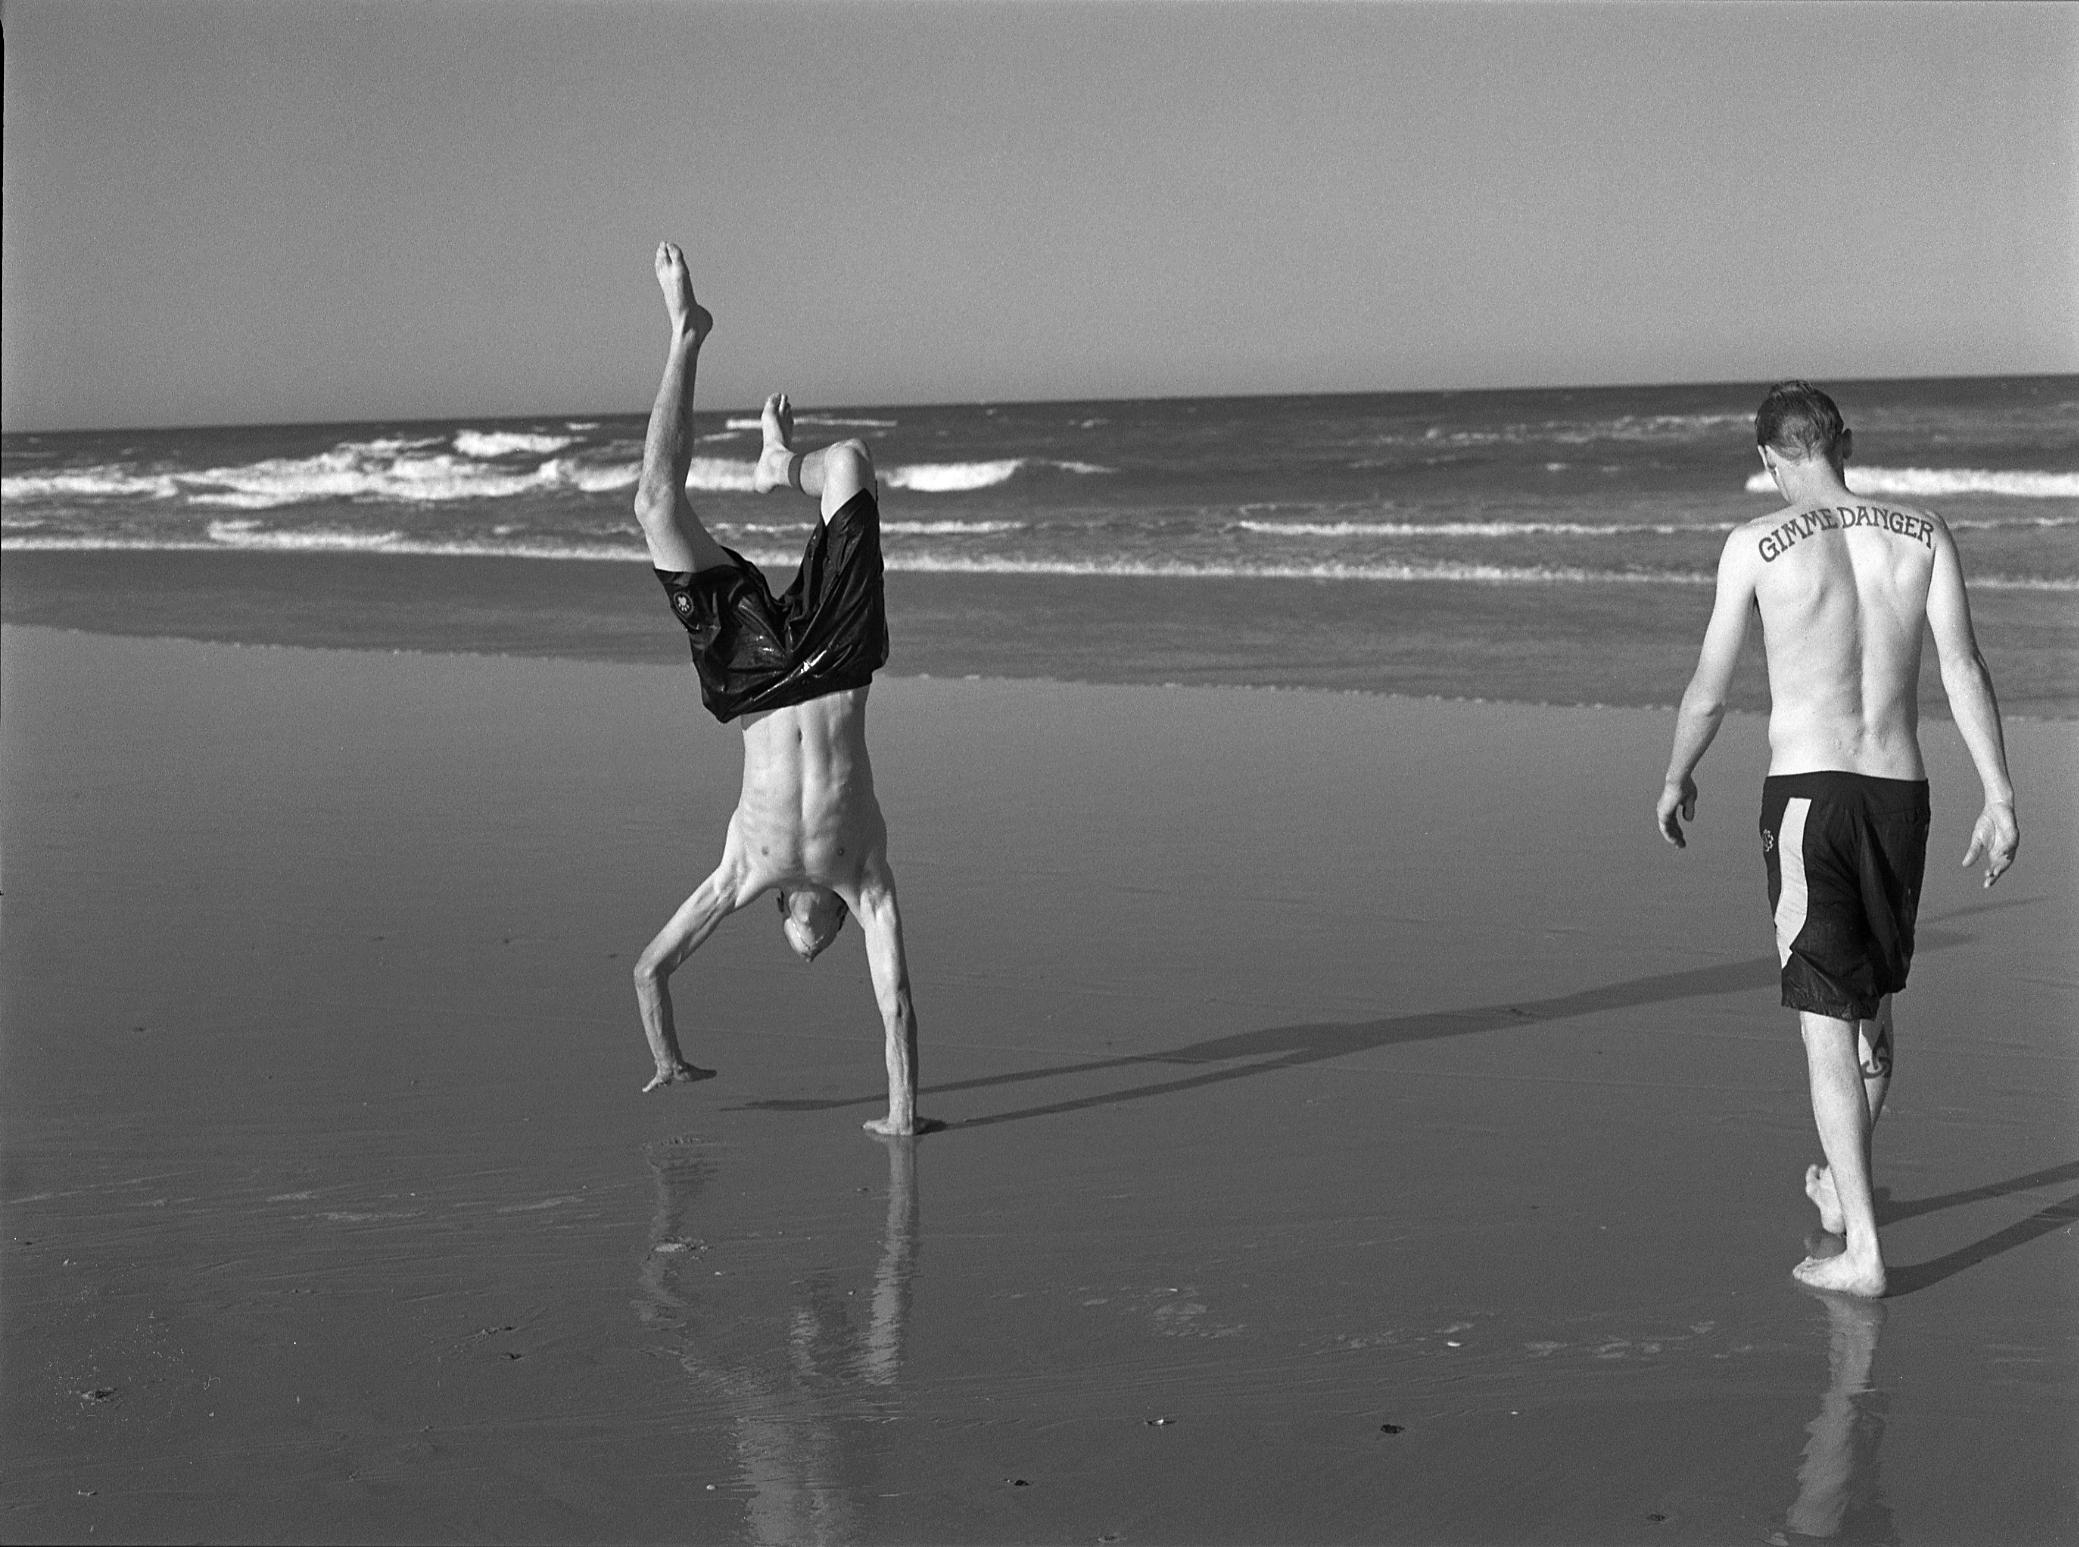 Scott and Alan, Australia, 1996